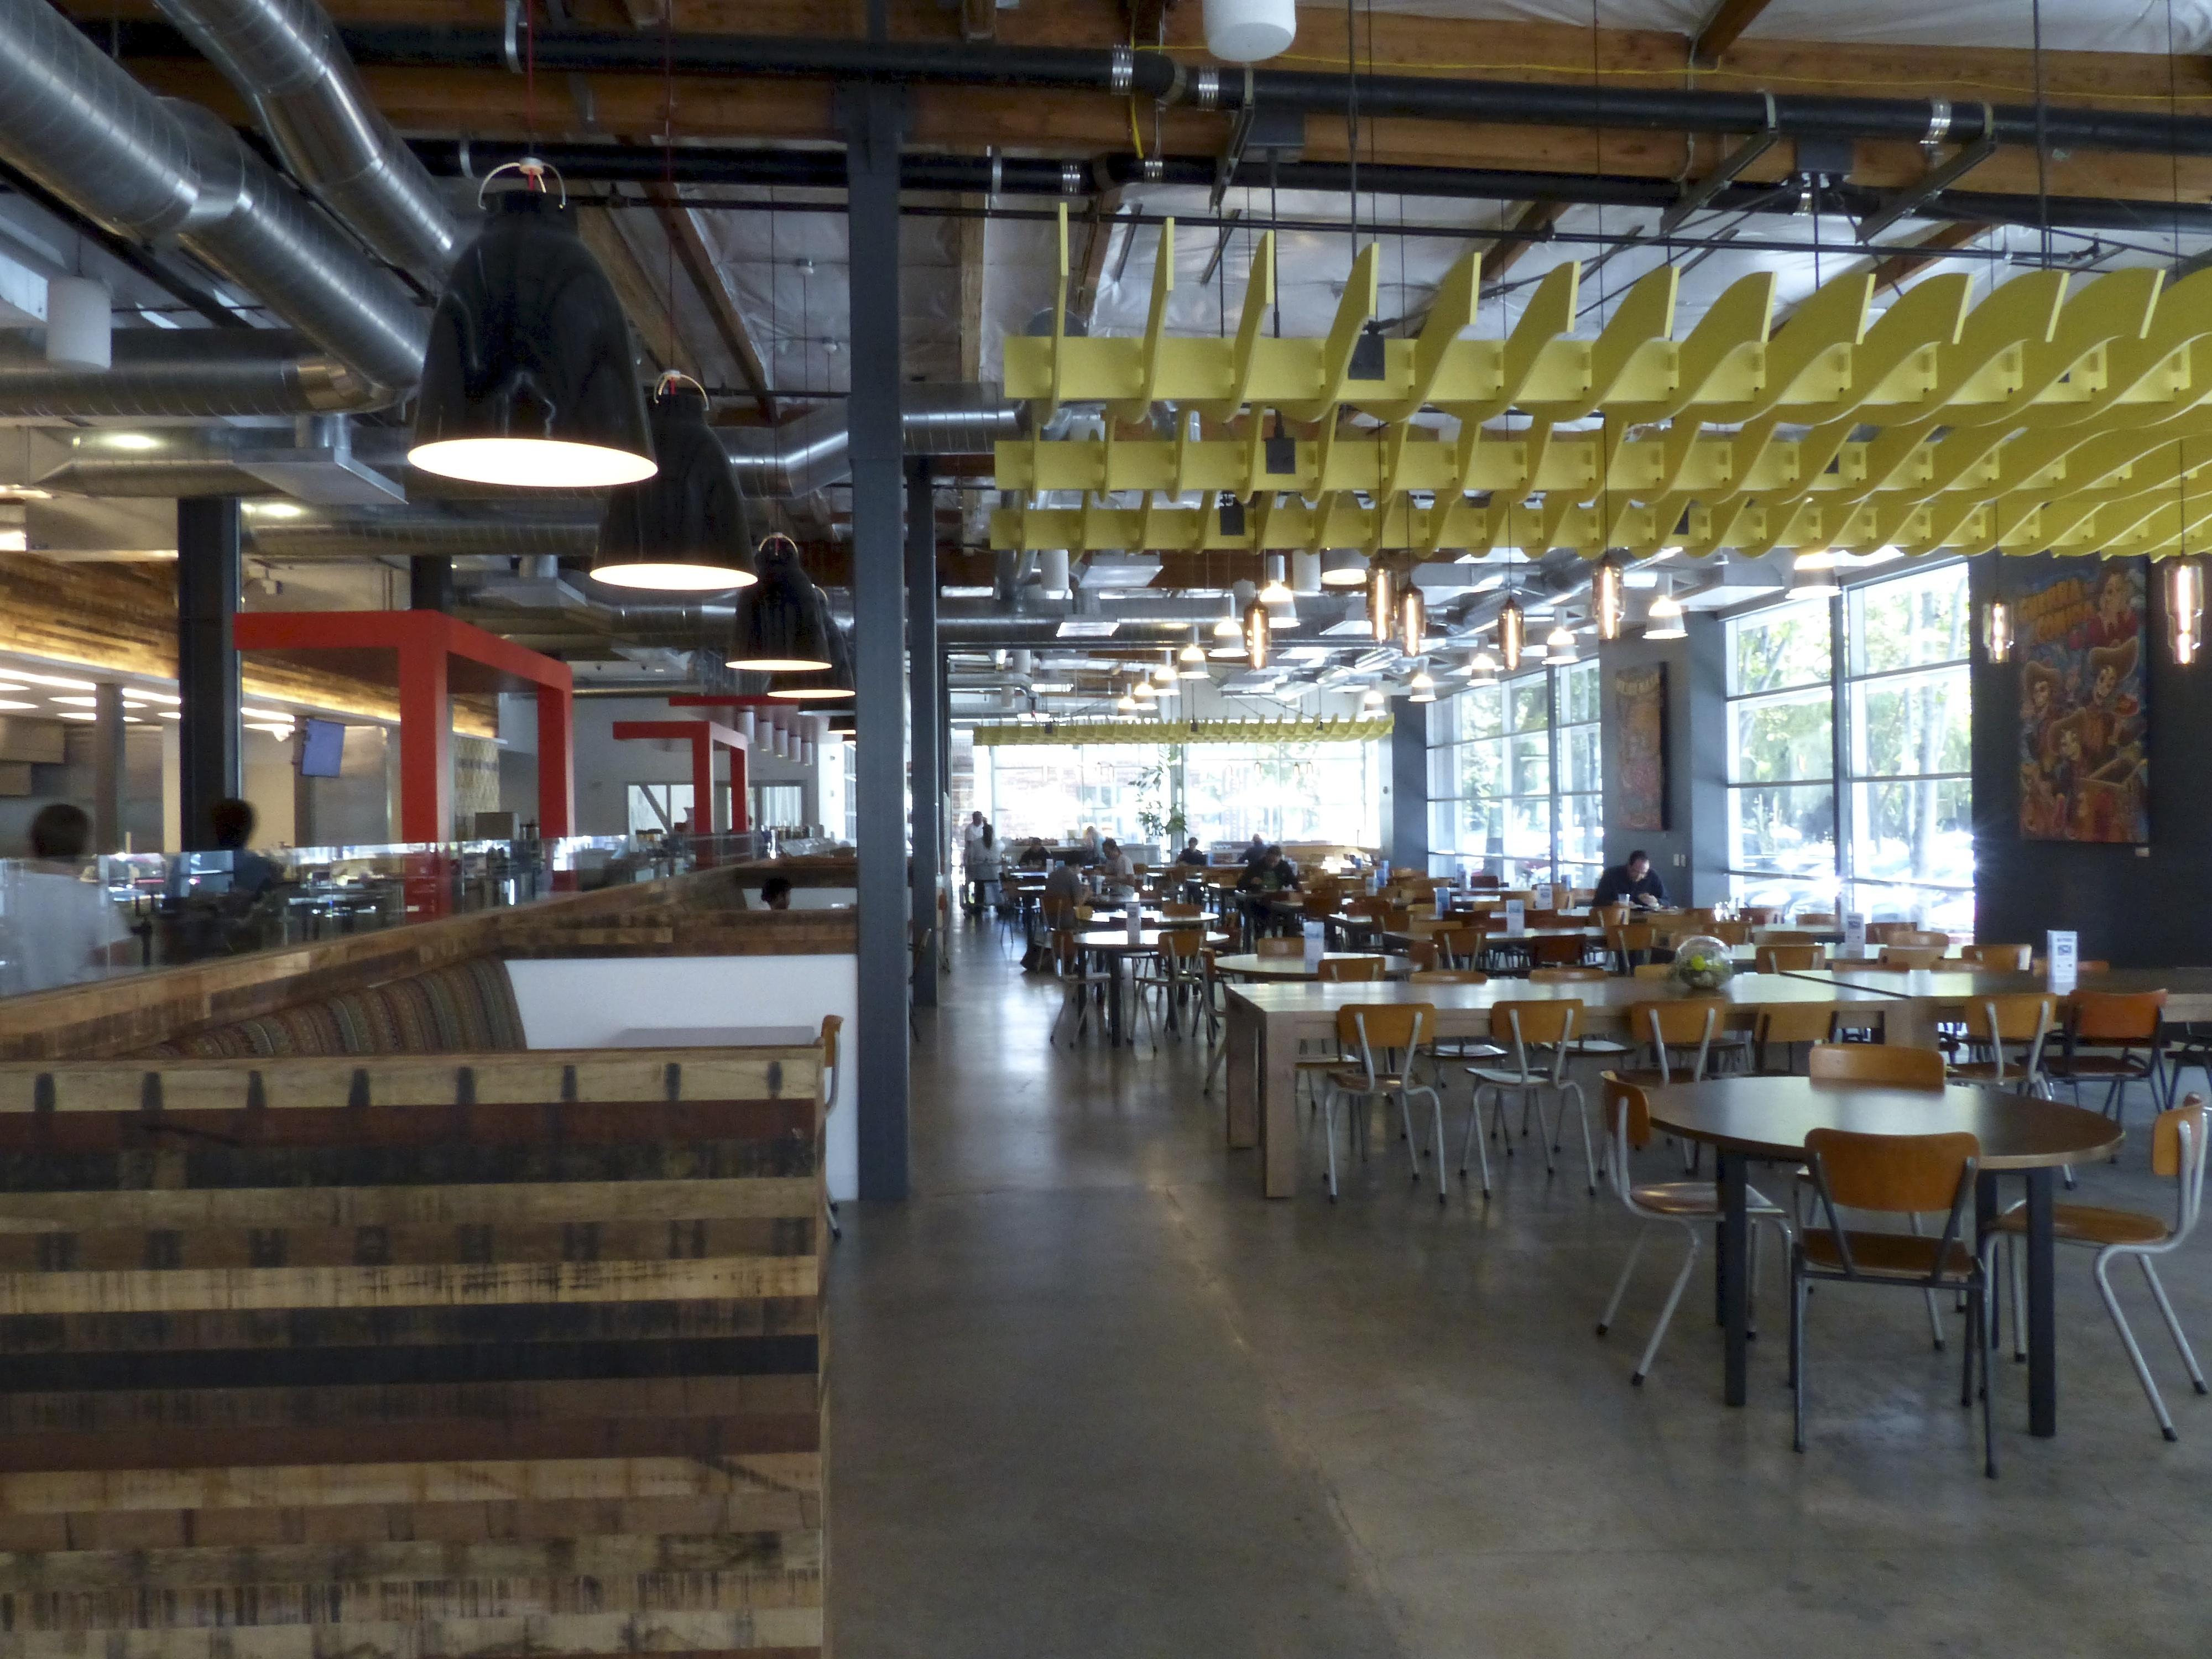 Innenarchitektur Usa kostenlose foto holz restaurant tal reise usa fabrik